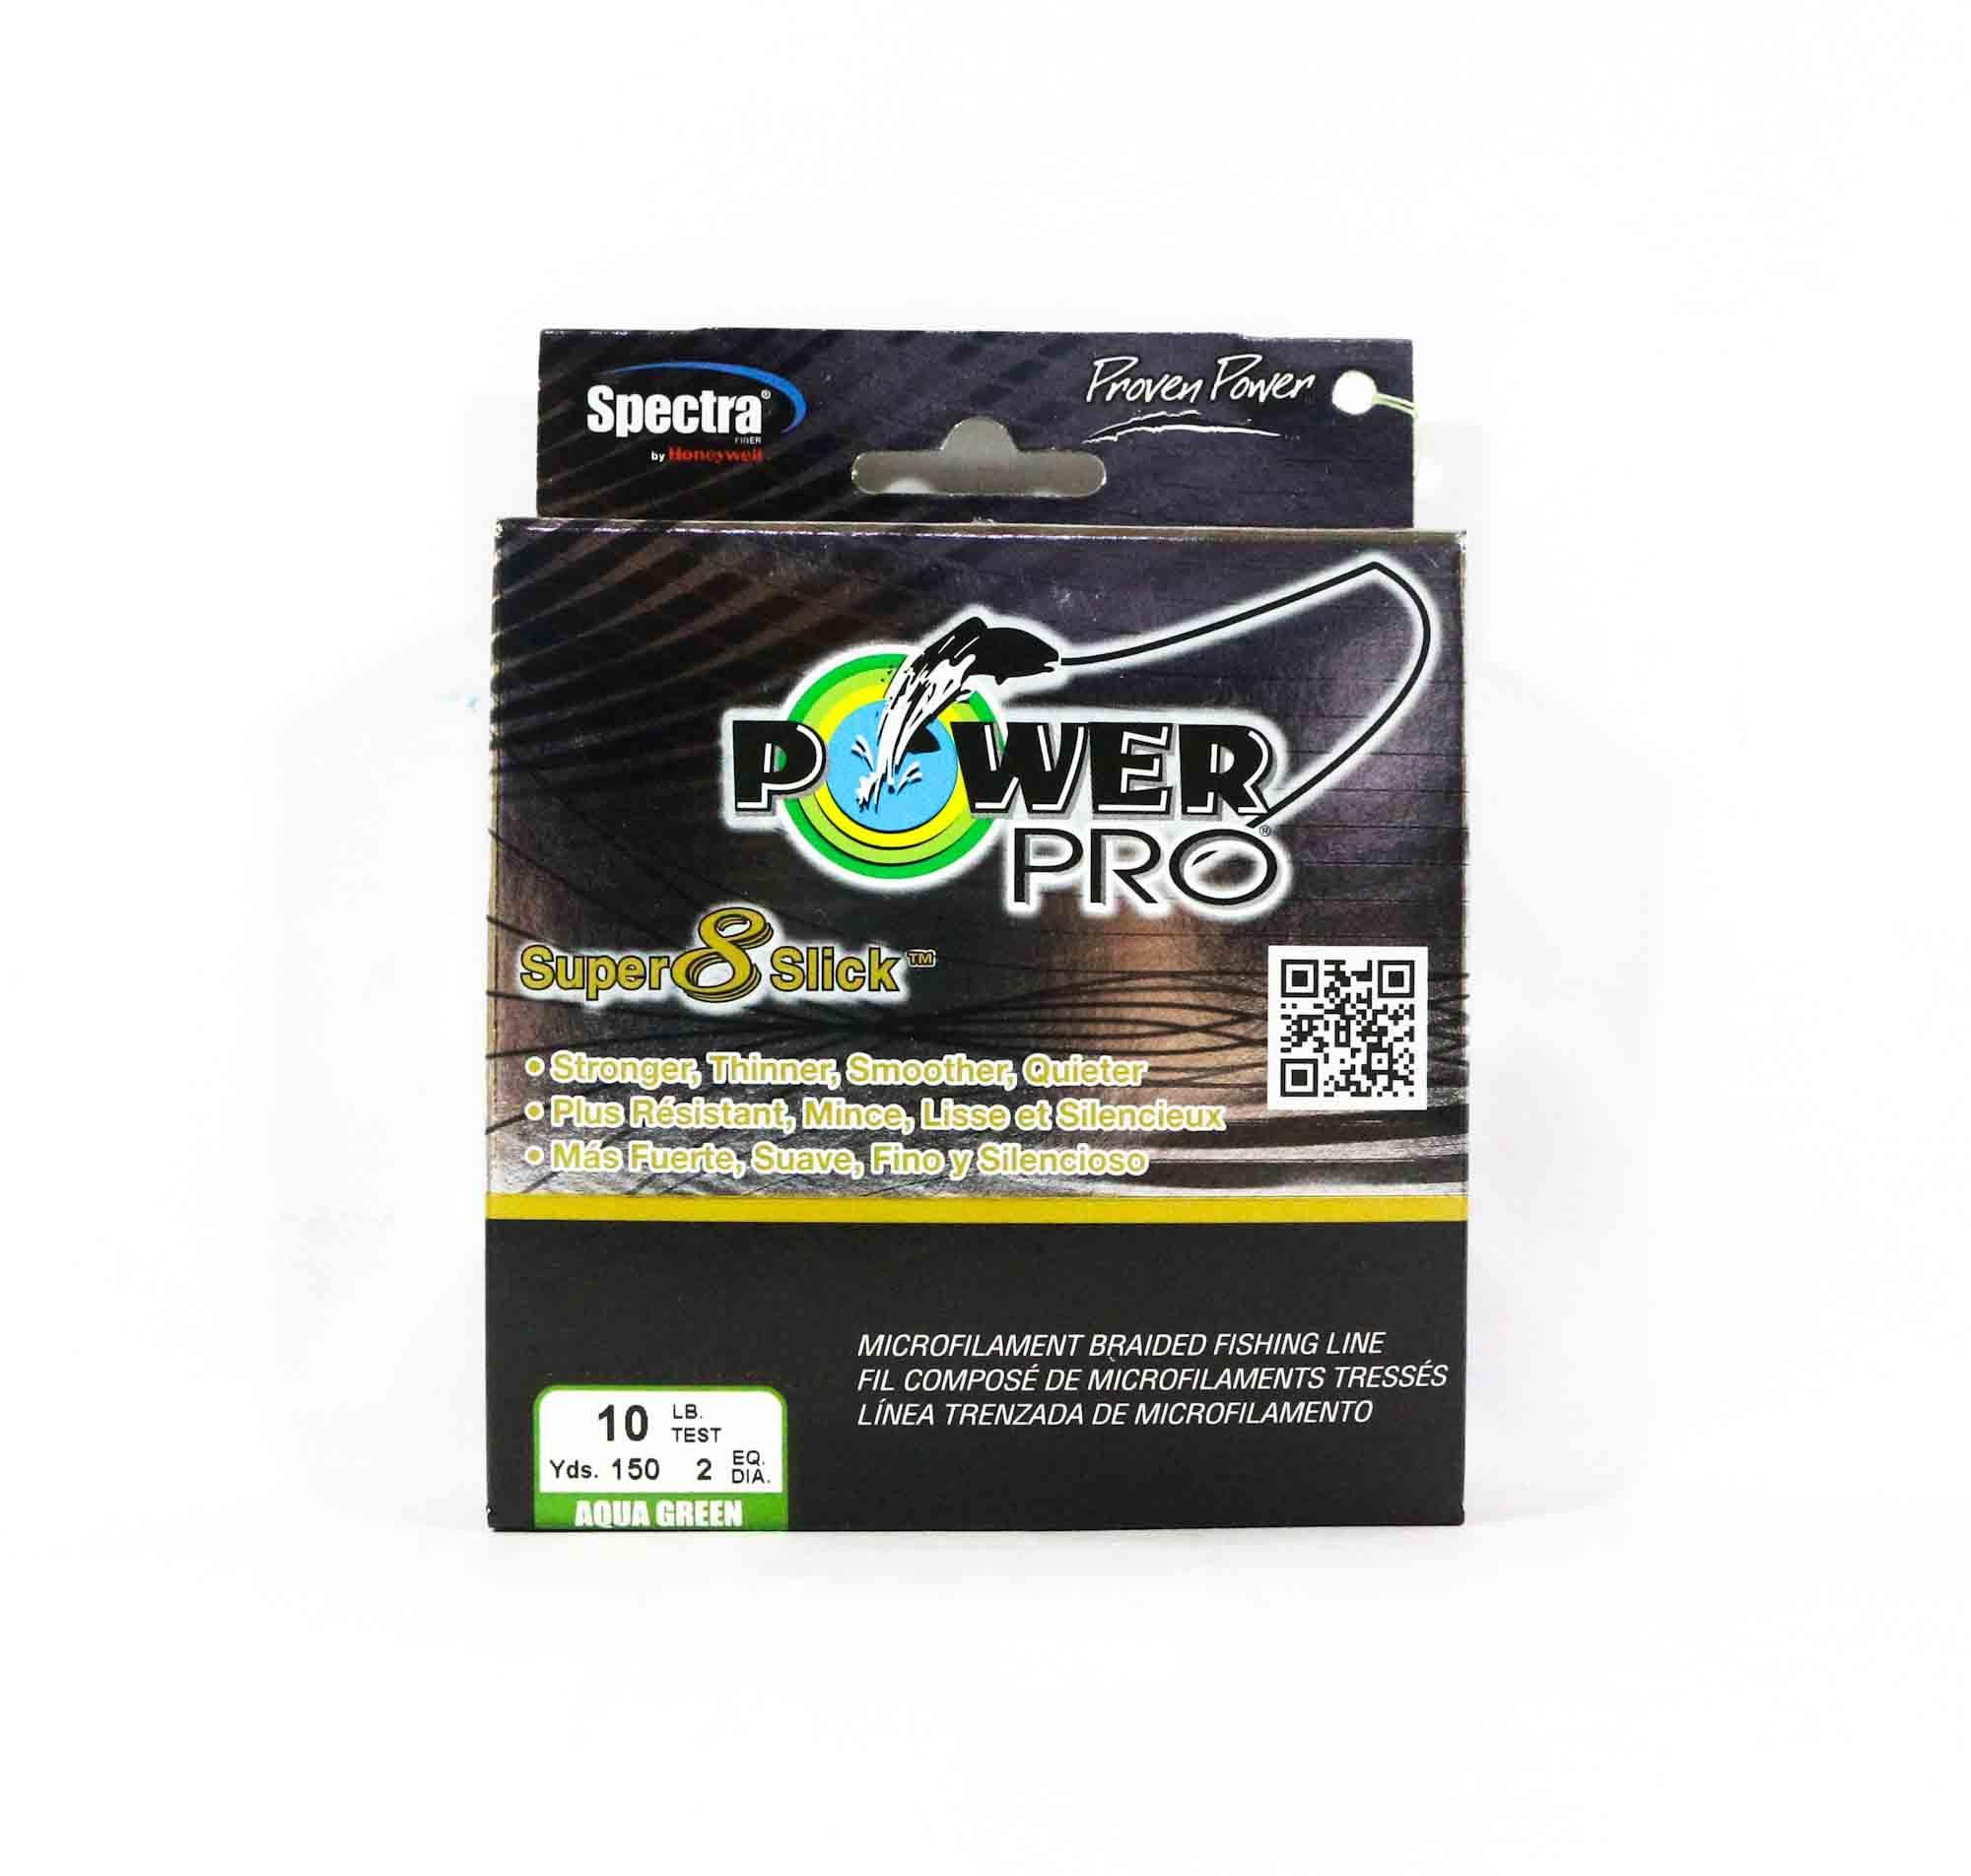 Power Pro Super 8 Slick Spectra Line 10lb by 150yds Green (0619)